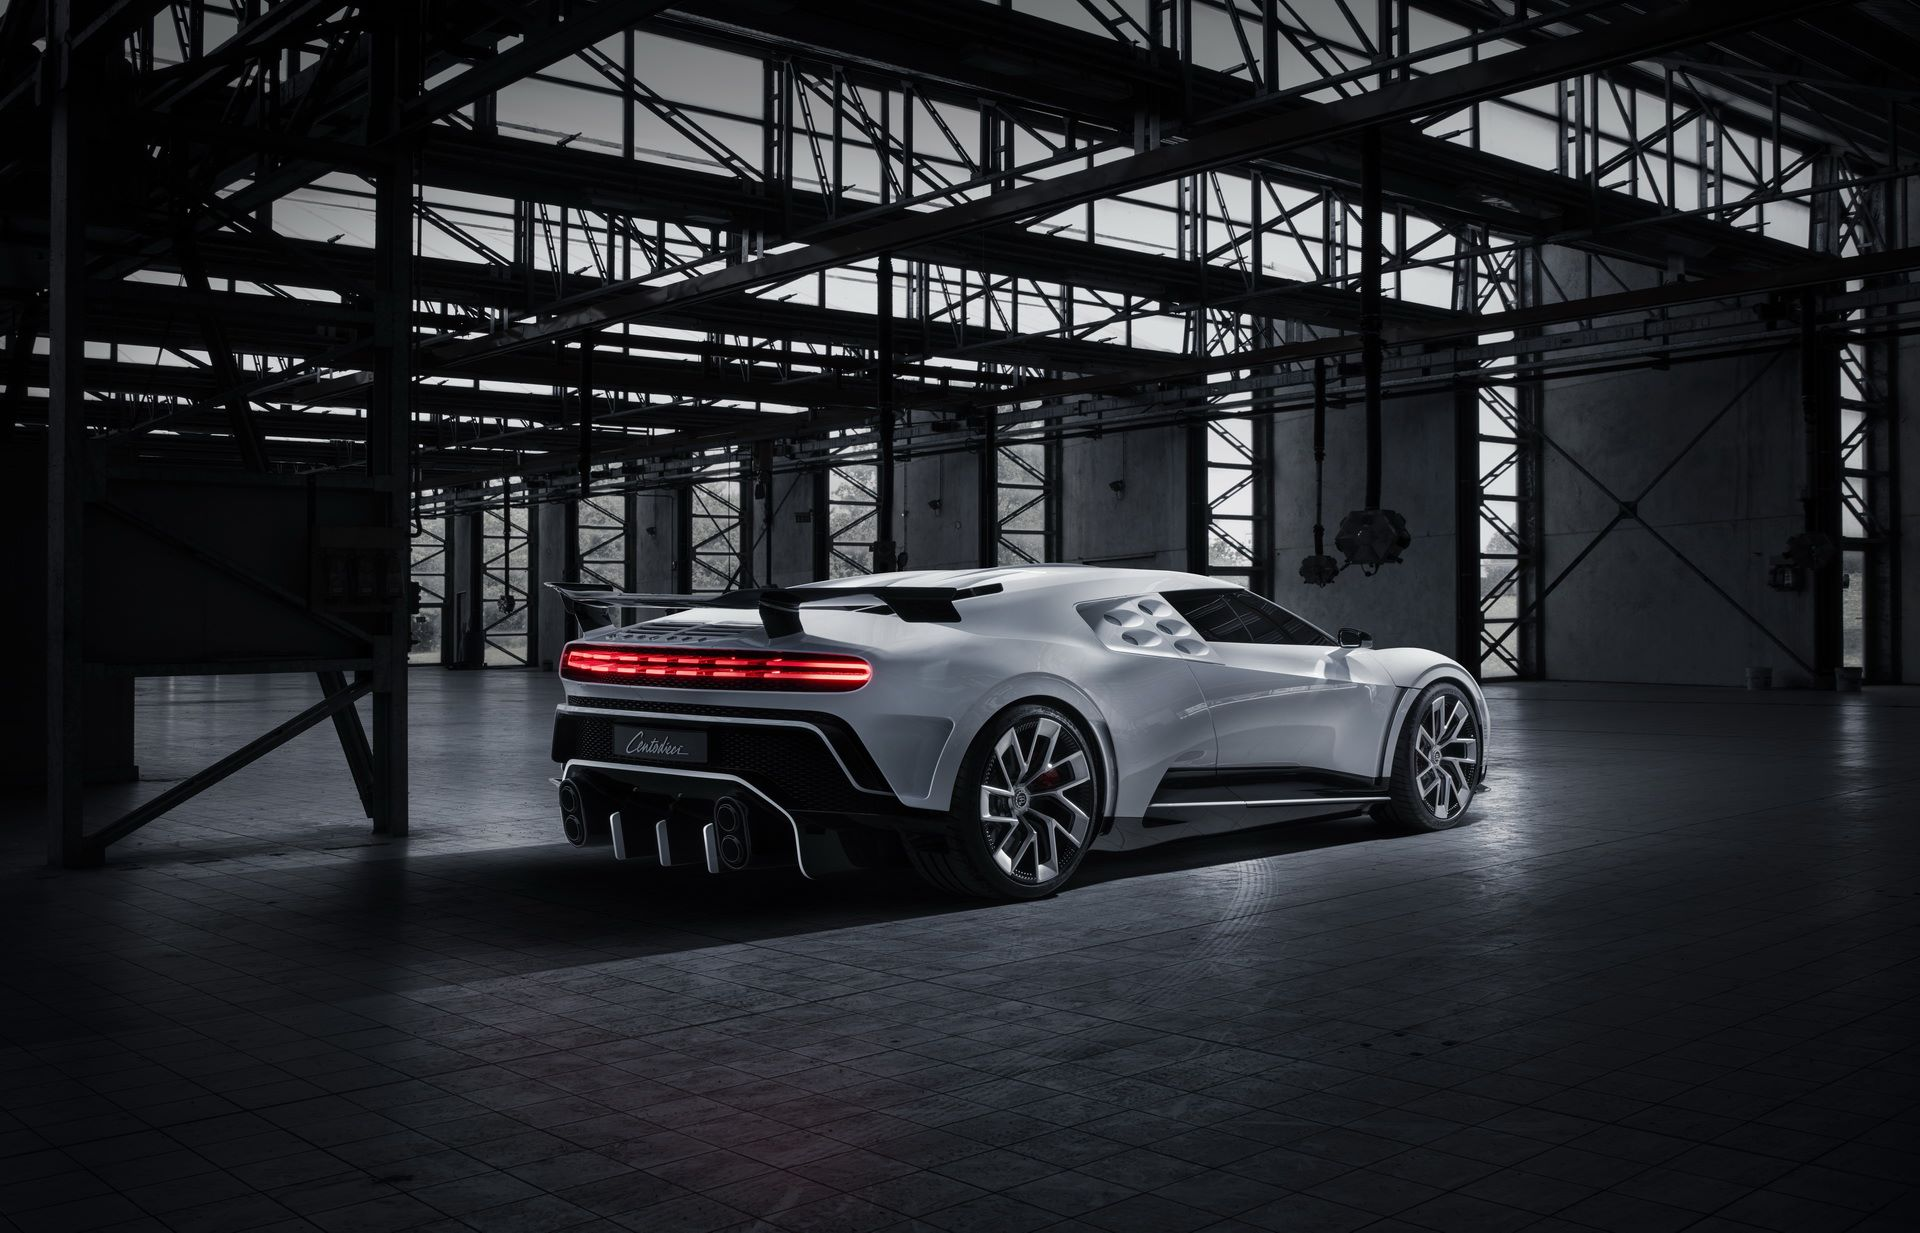 Bugatti-Centodieci-prototype-12